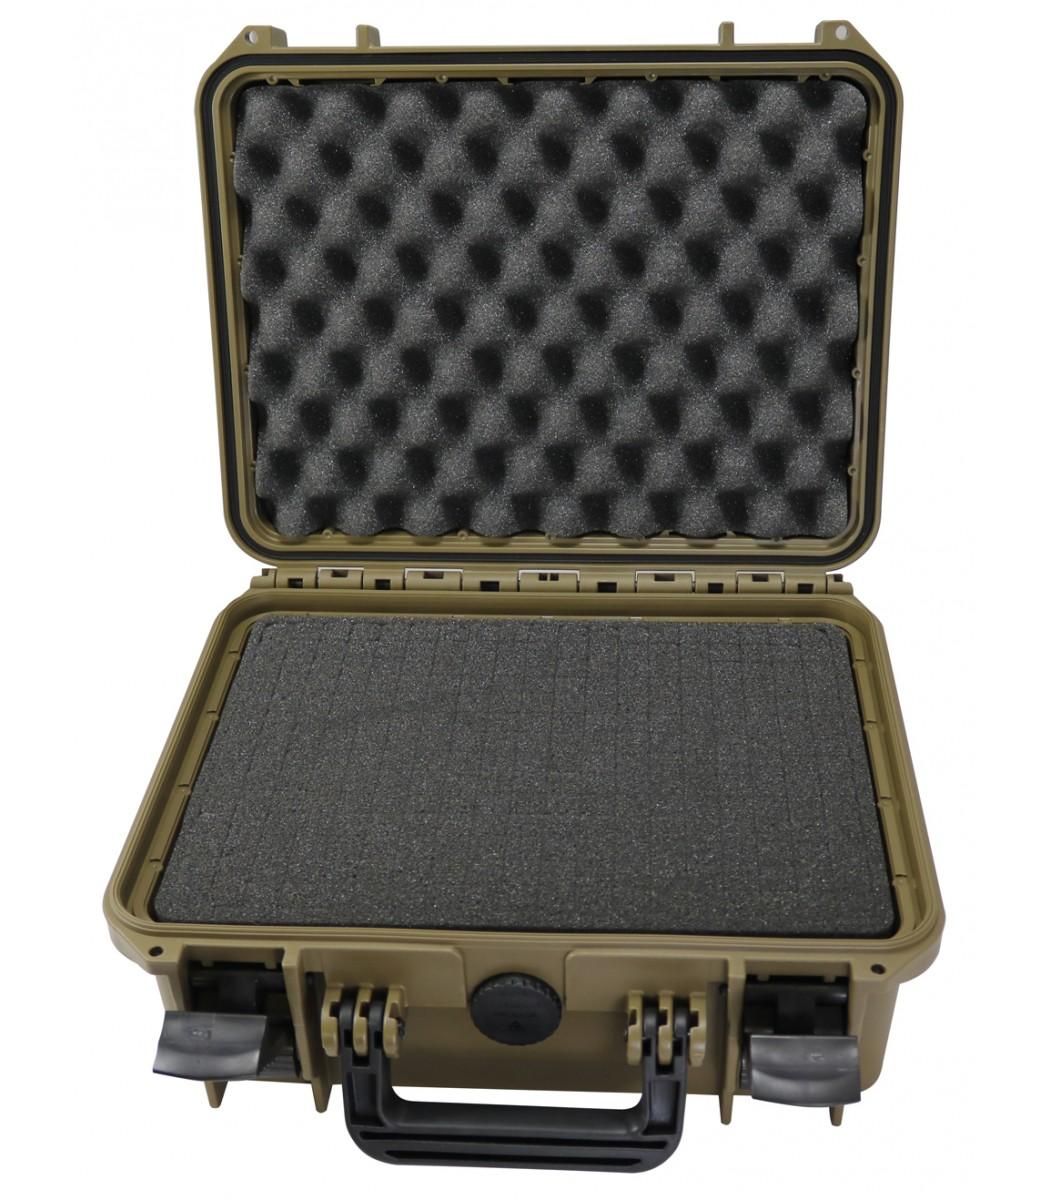 Valigia Ermetica Elephant Case Verde Media, spugne comprese. Dimensioni interne : 430 x 290 x 160 mm